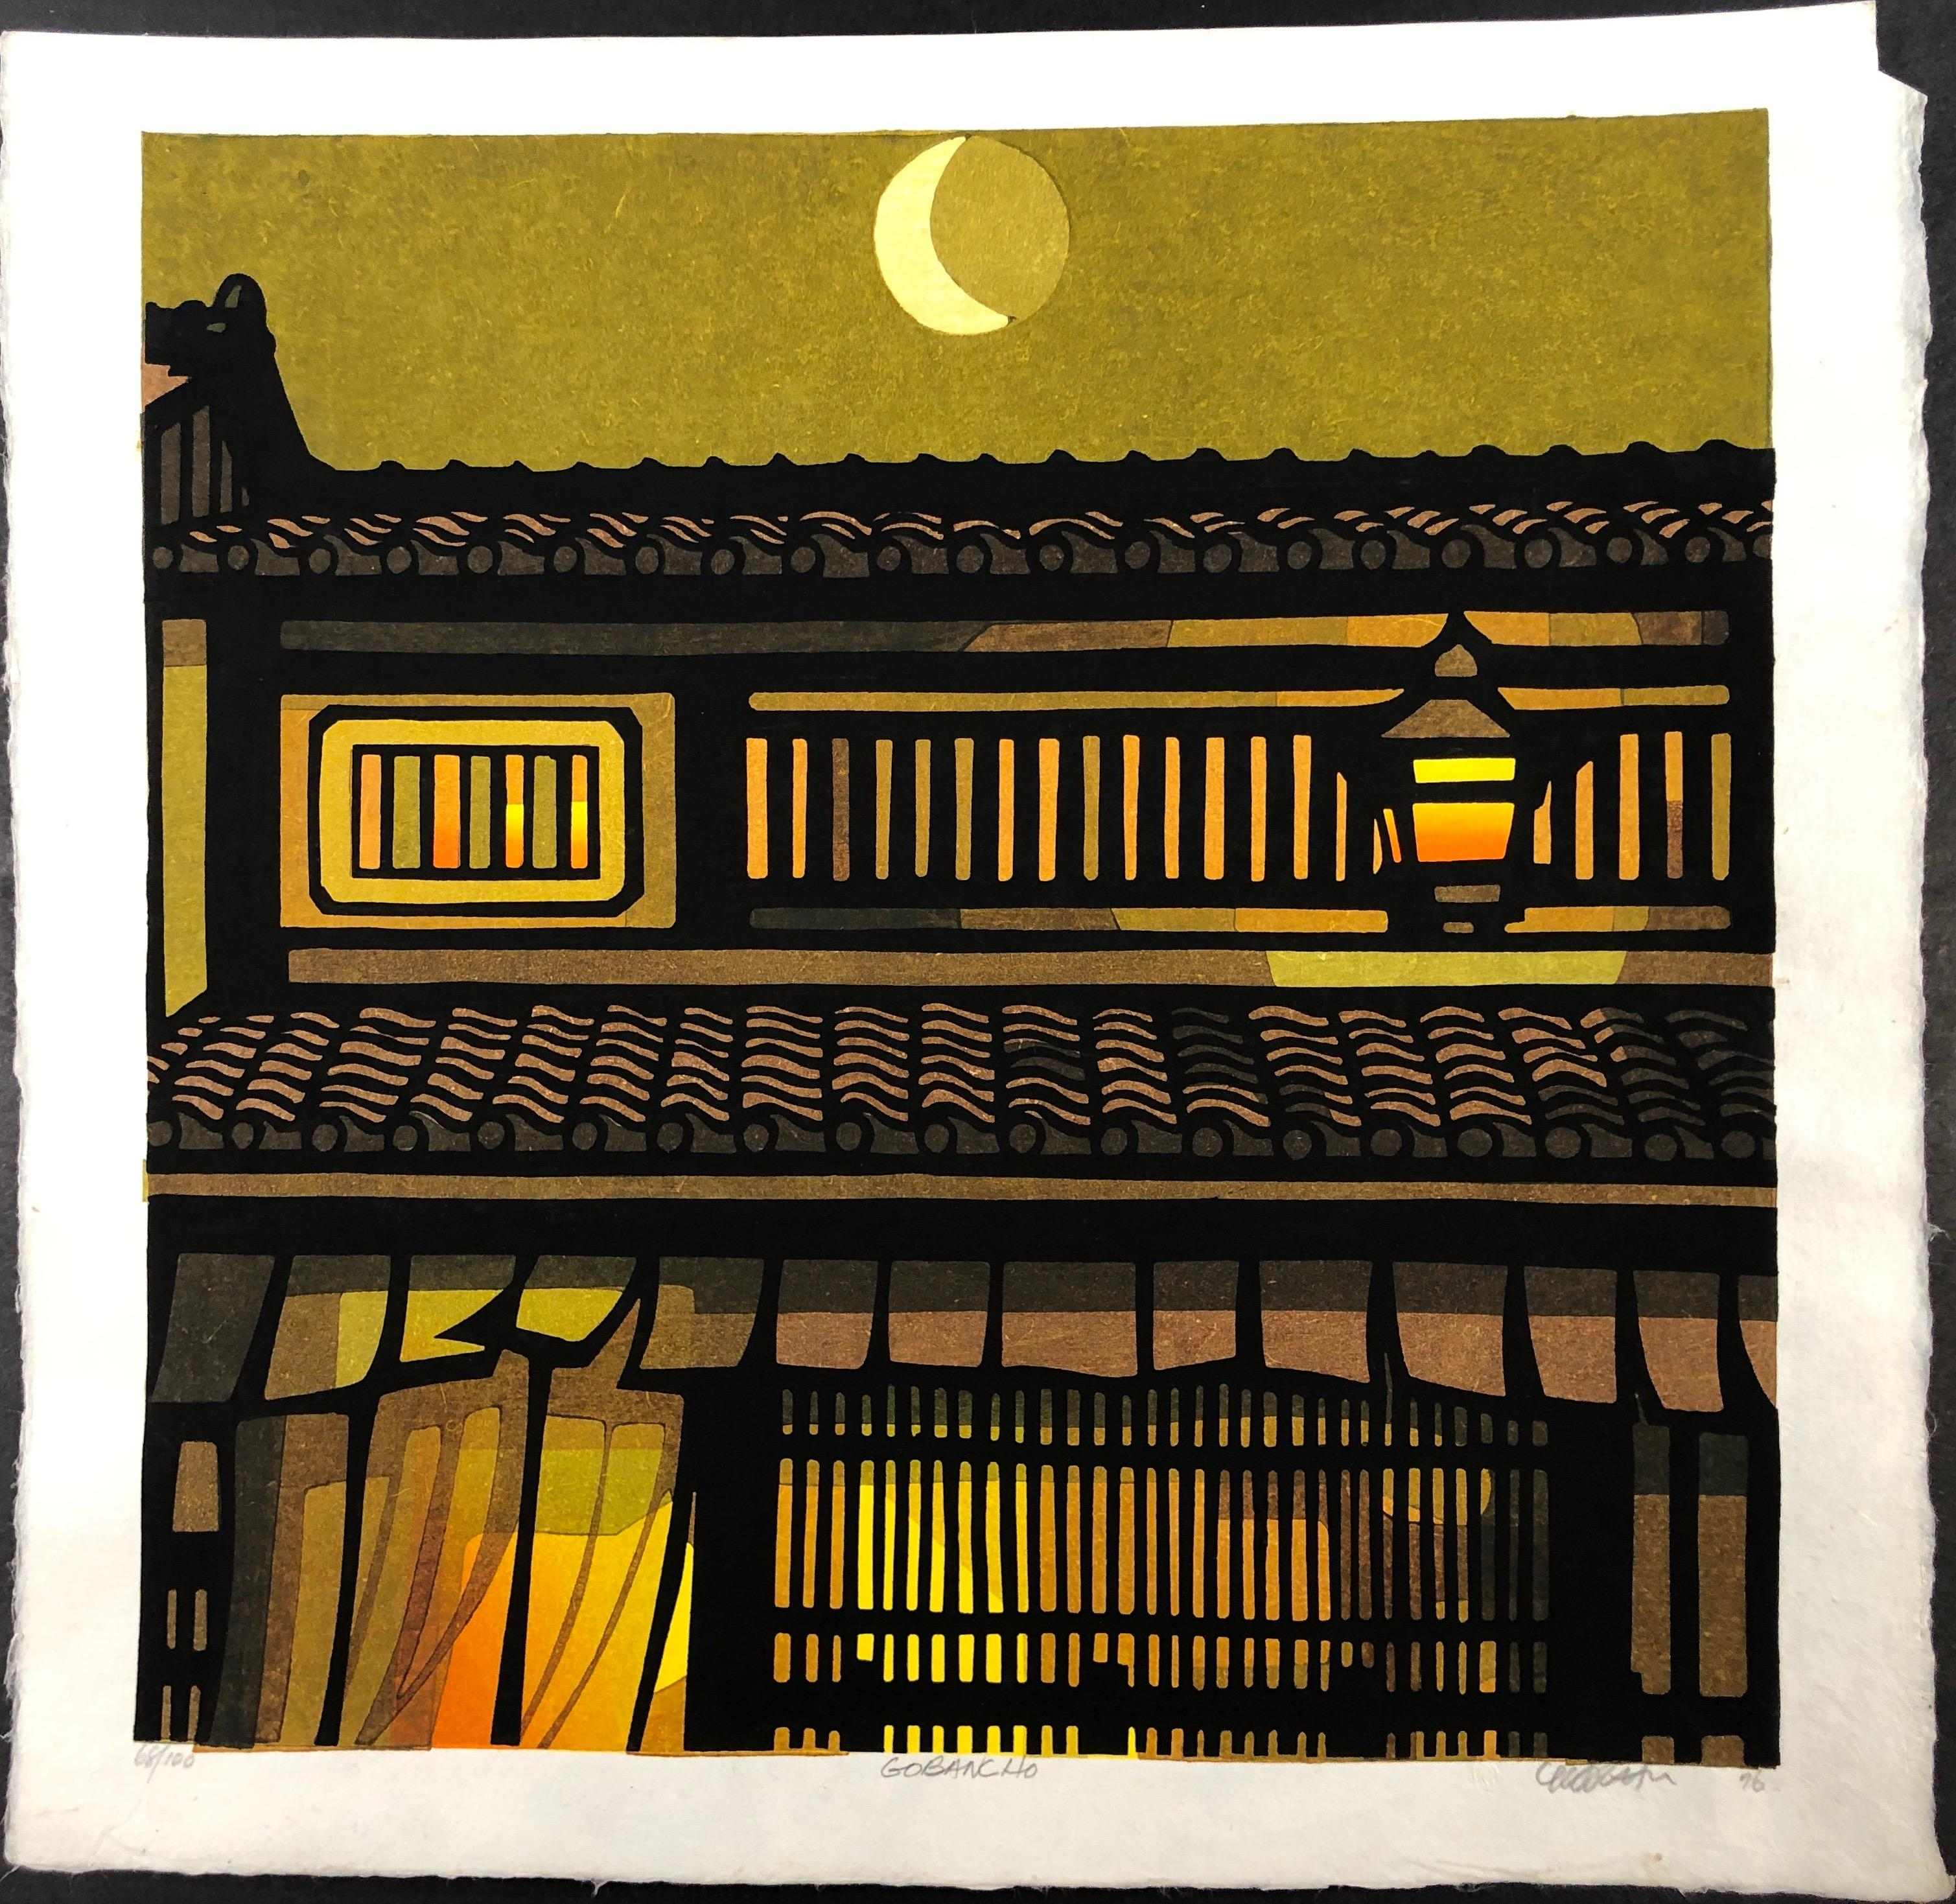 Gobancho, Japanese, woodblock print, limited edition, yellow, brown, green,night